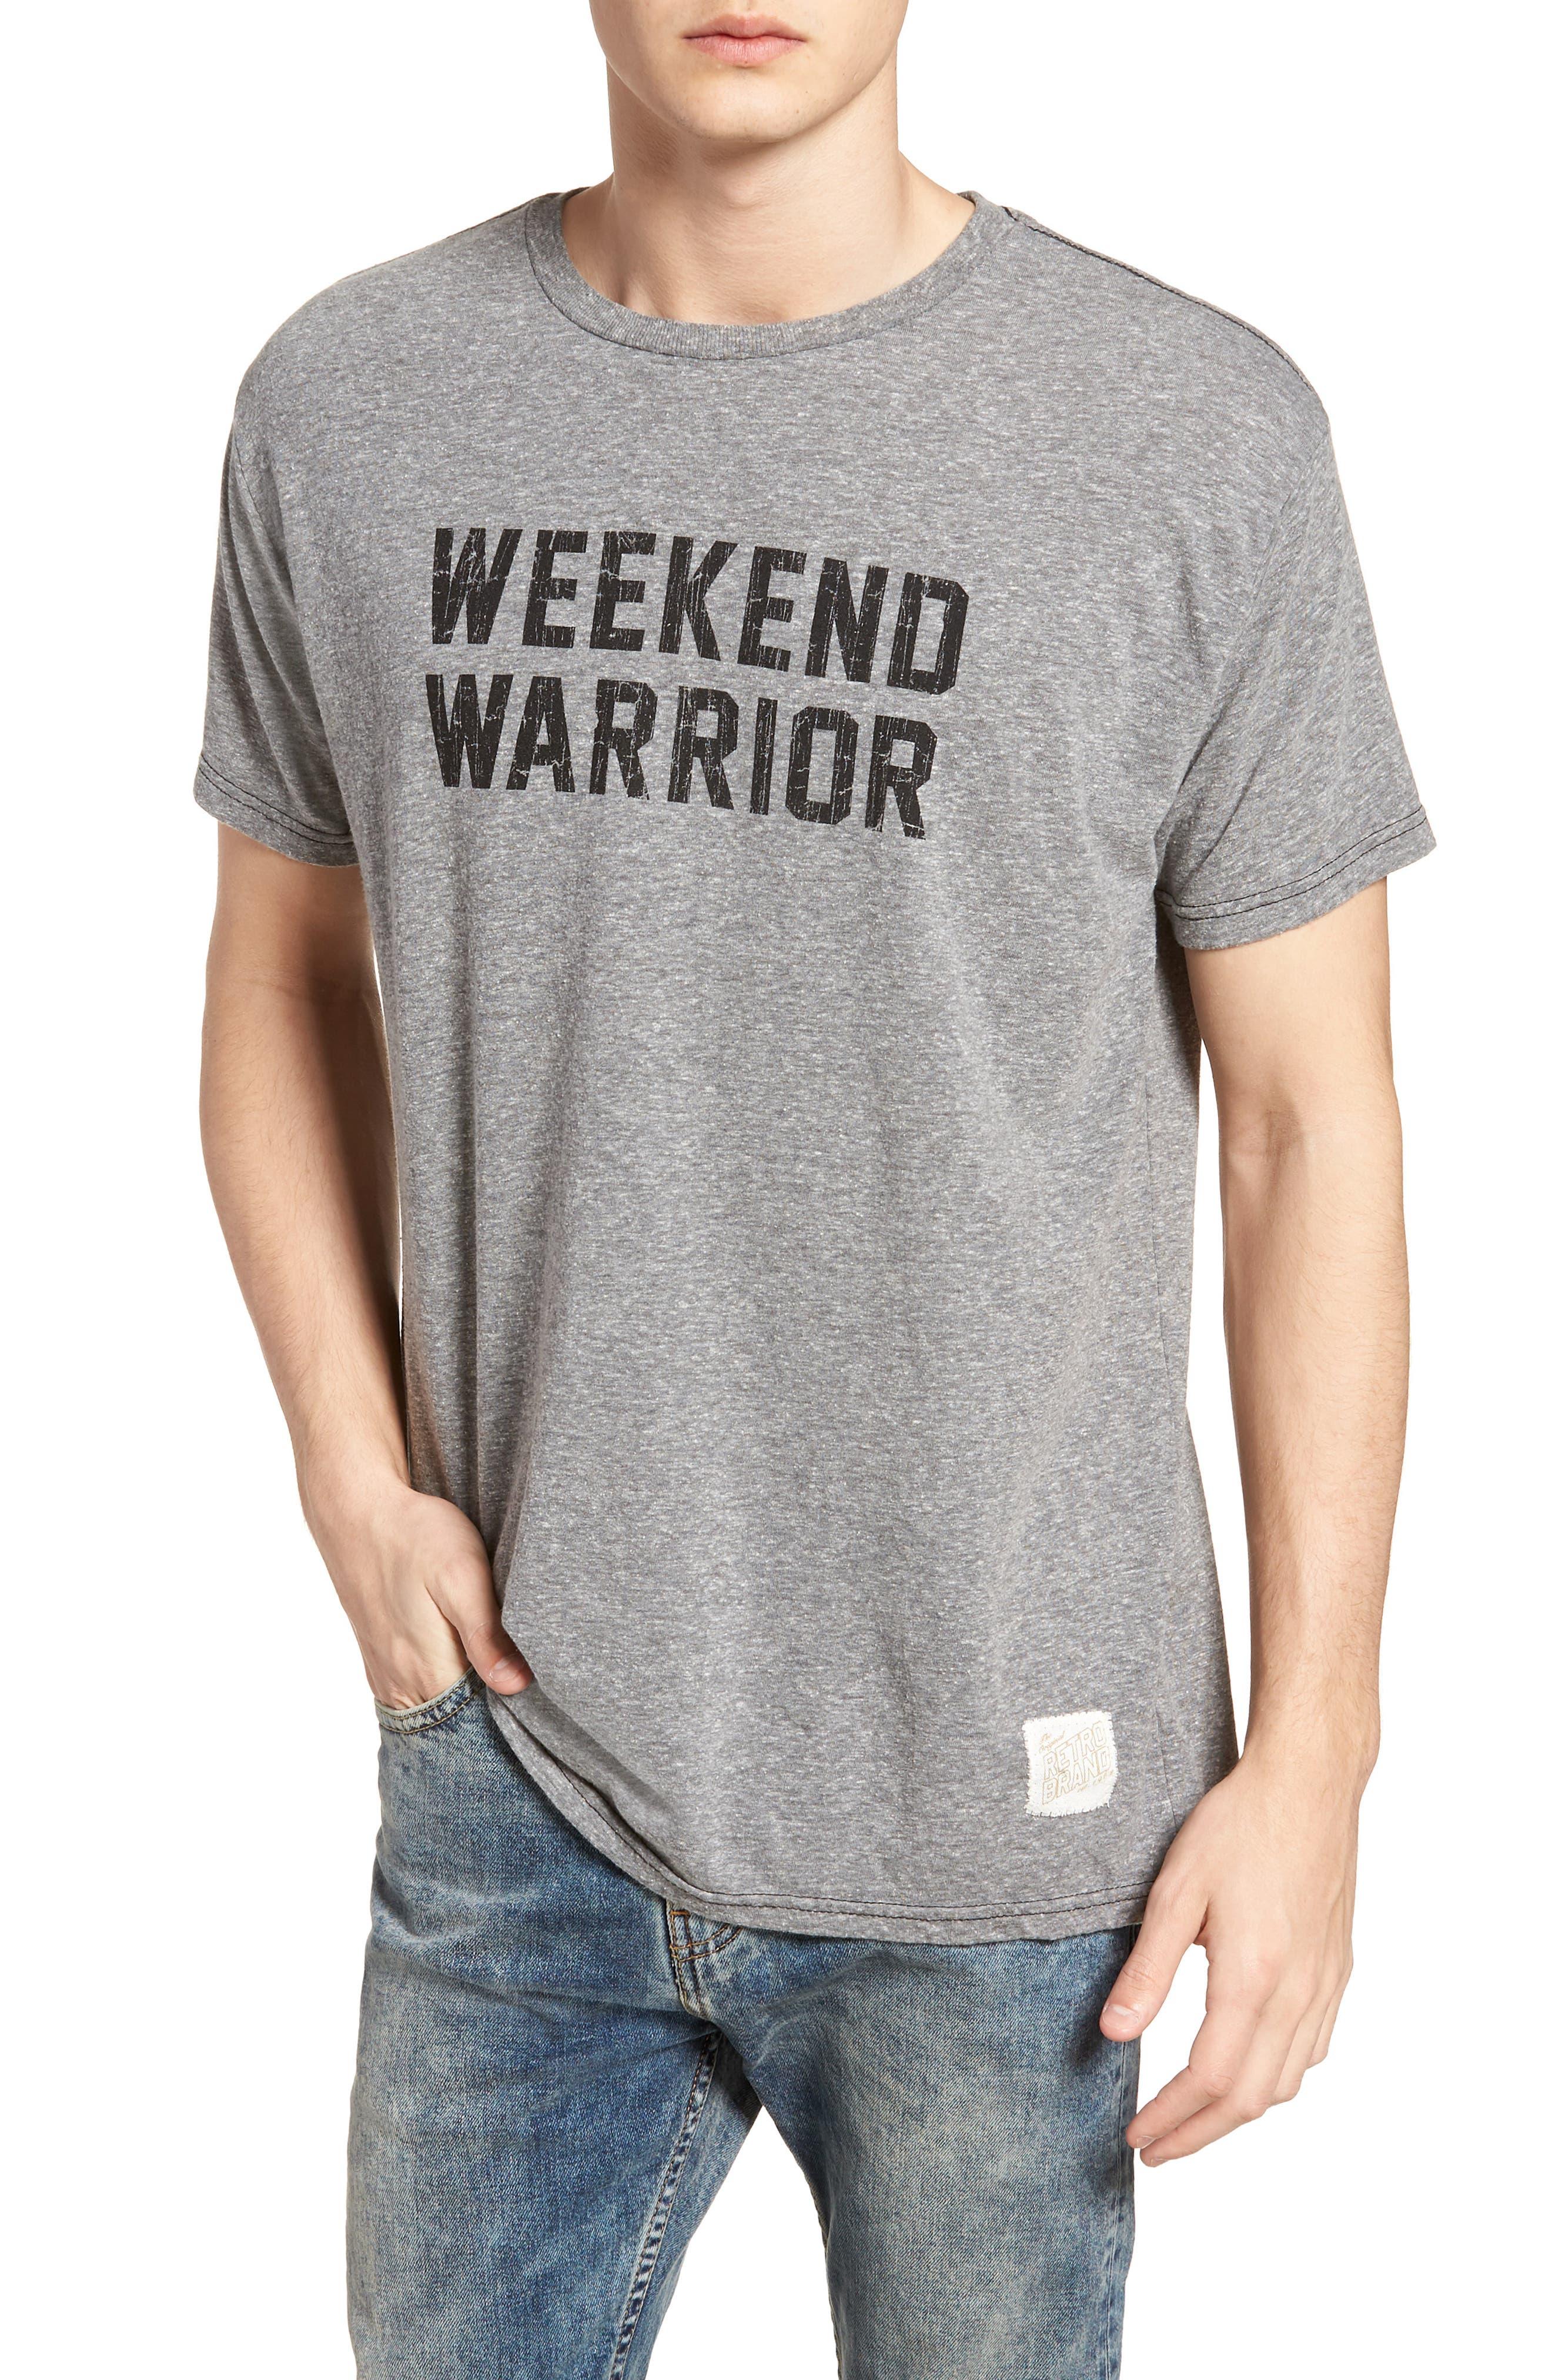 Main Image - Retro Brand Weekend Warrior T-Shirt